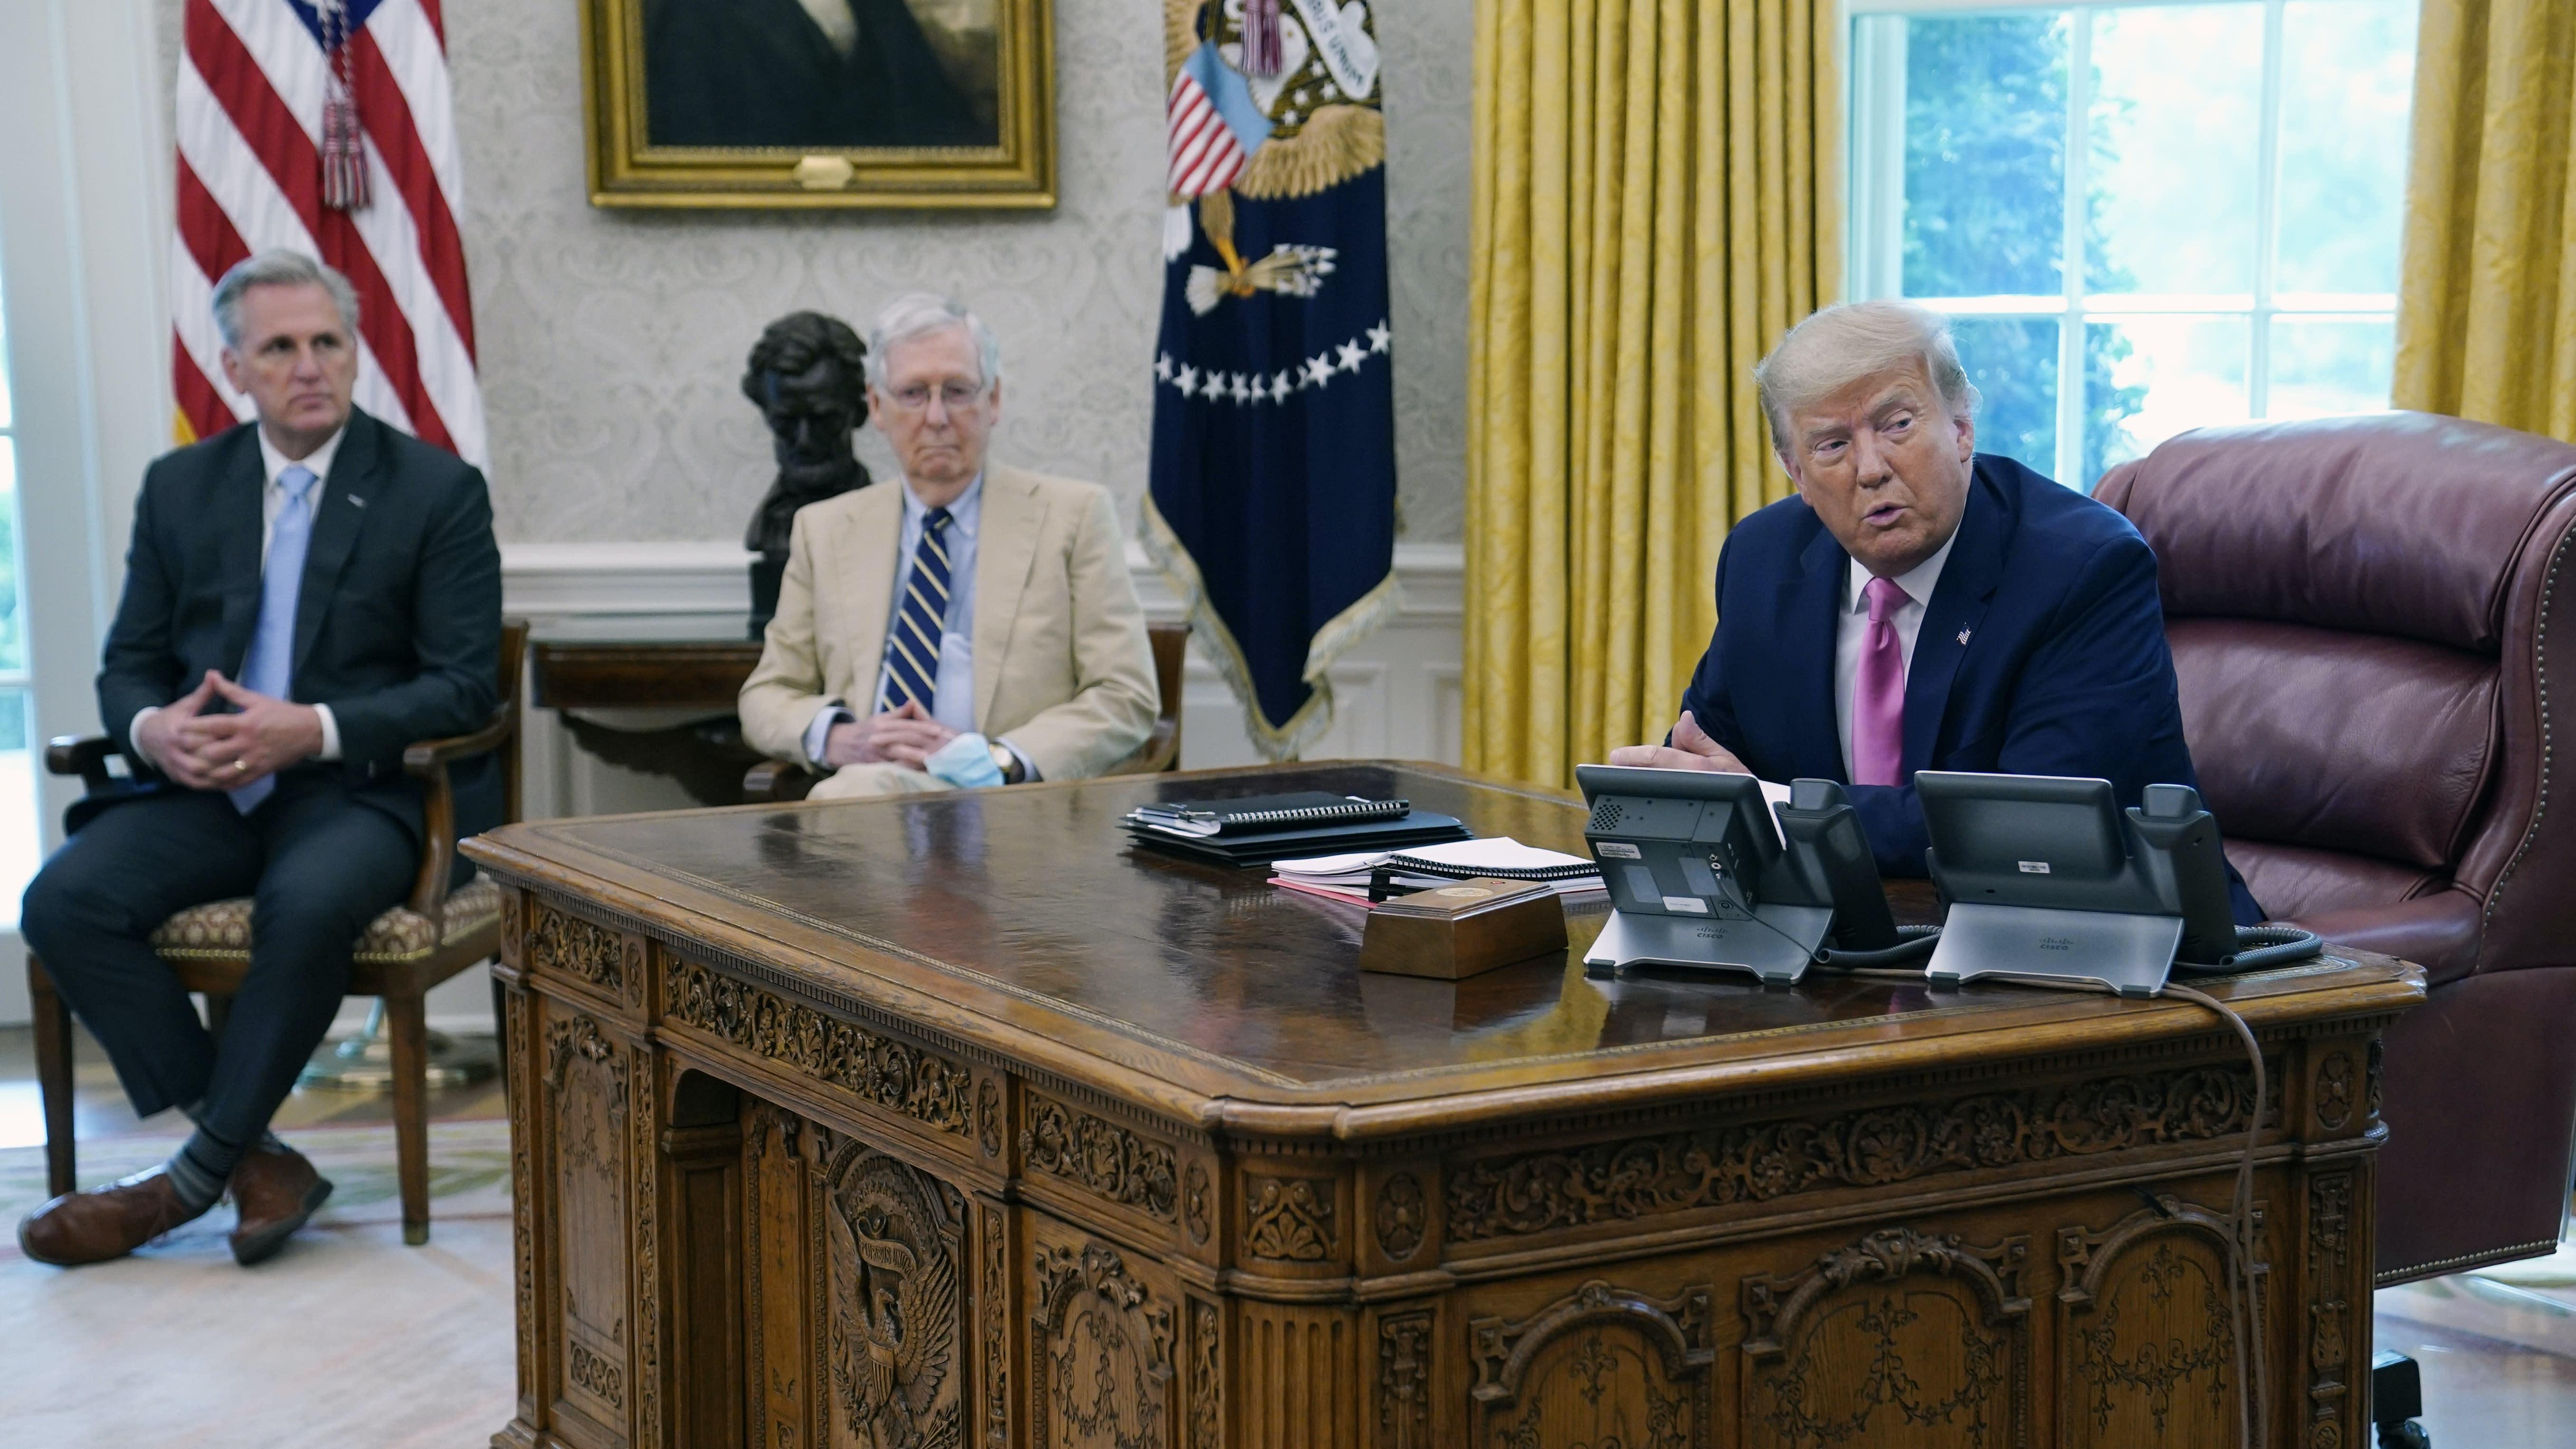 Trump, Congress battle over more virus aid as crisis worsens